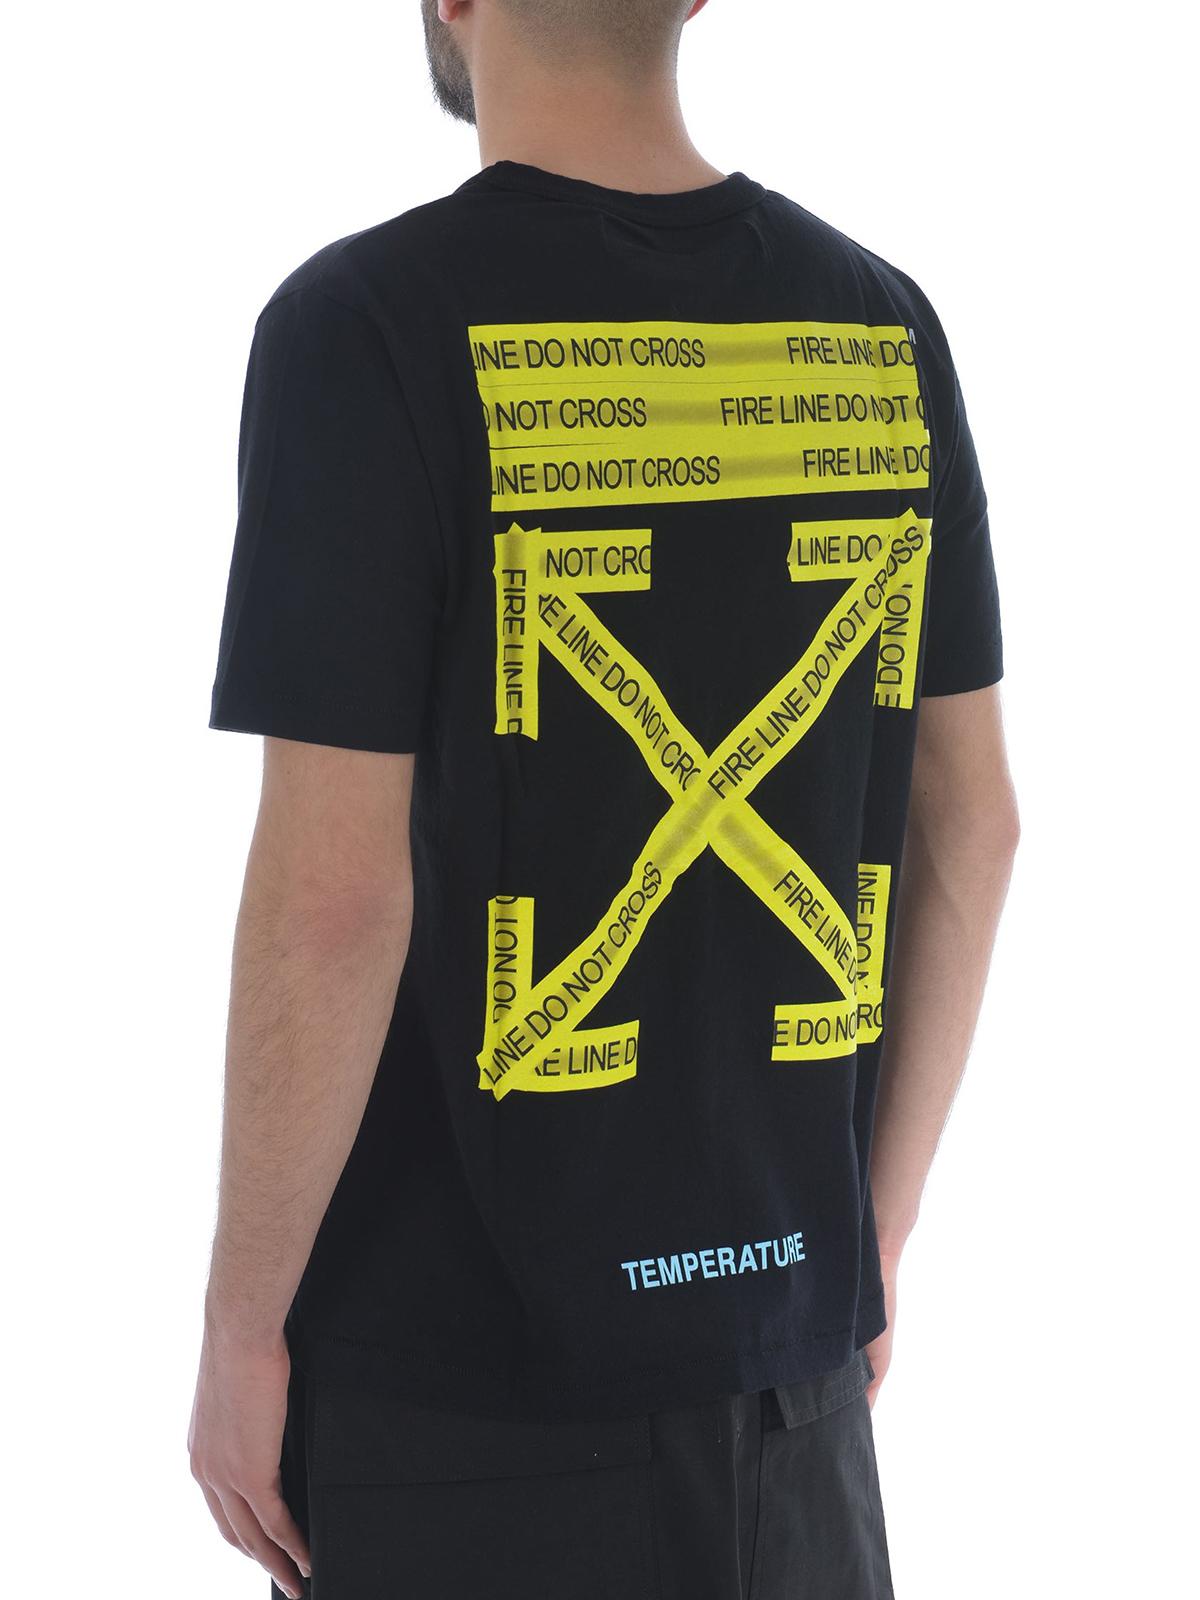 ace5364a26e3 Off-White - Firetape black slim fit T-shirt - t-shirts ...